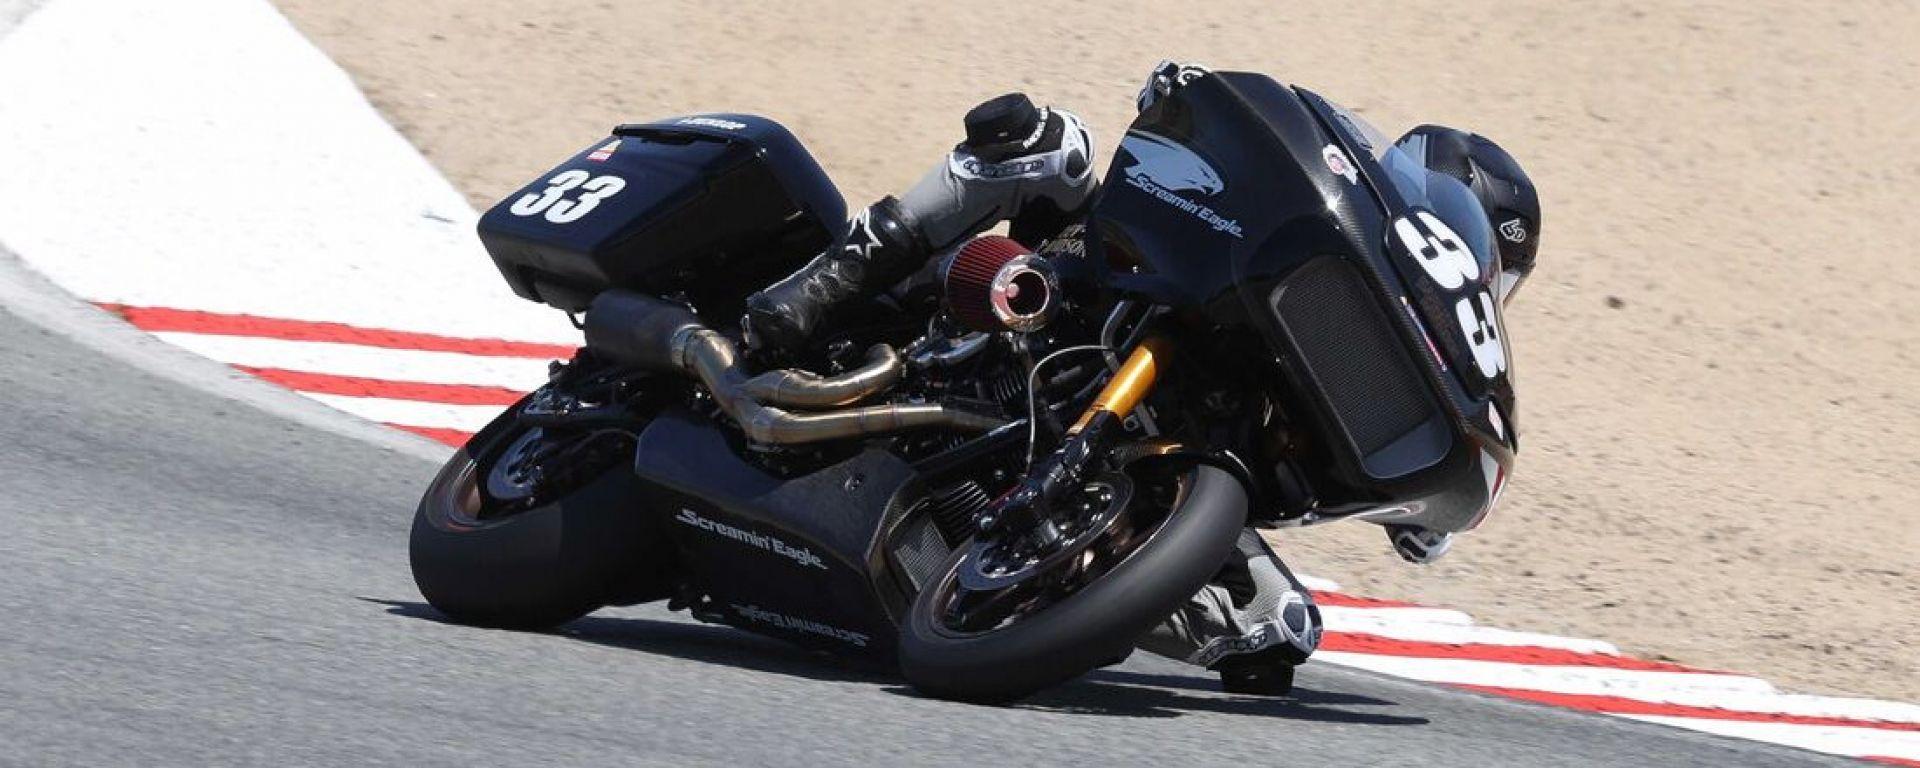 Kyle Wyman in sella alla Harley-Davidson Road Glide Special: i campioni di King of the Baggers 2021